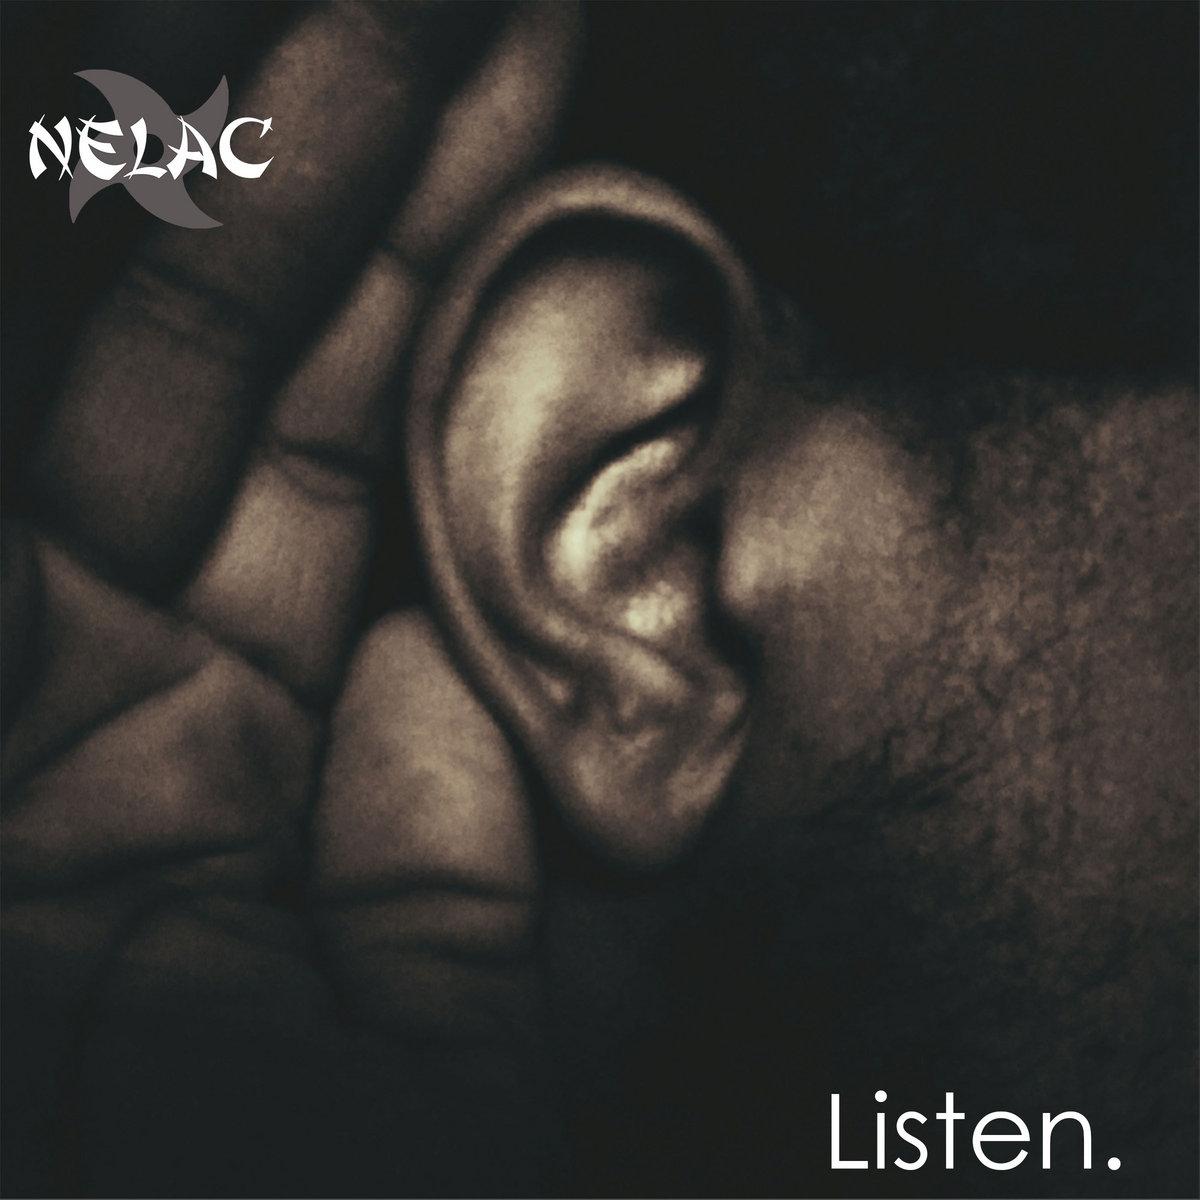 Listen by NELAC